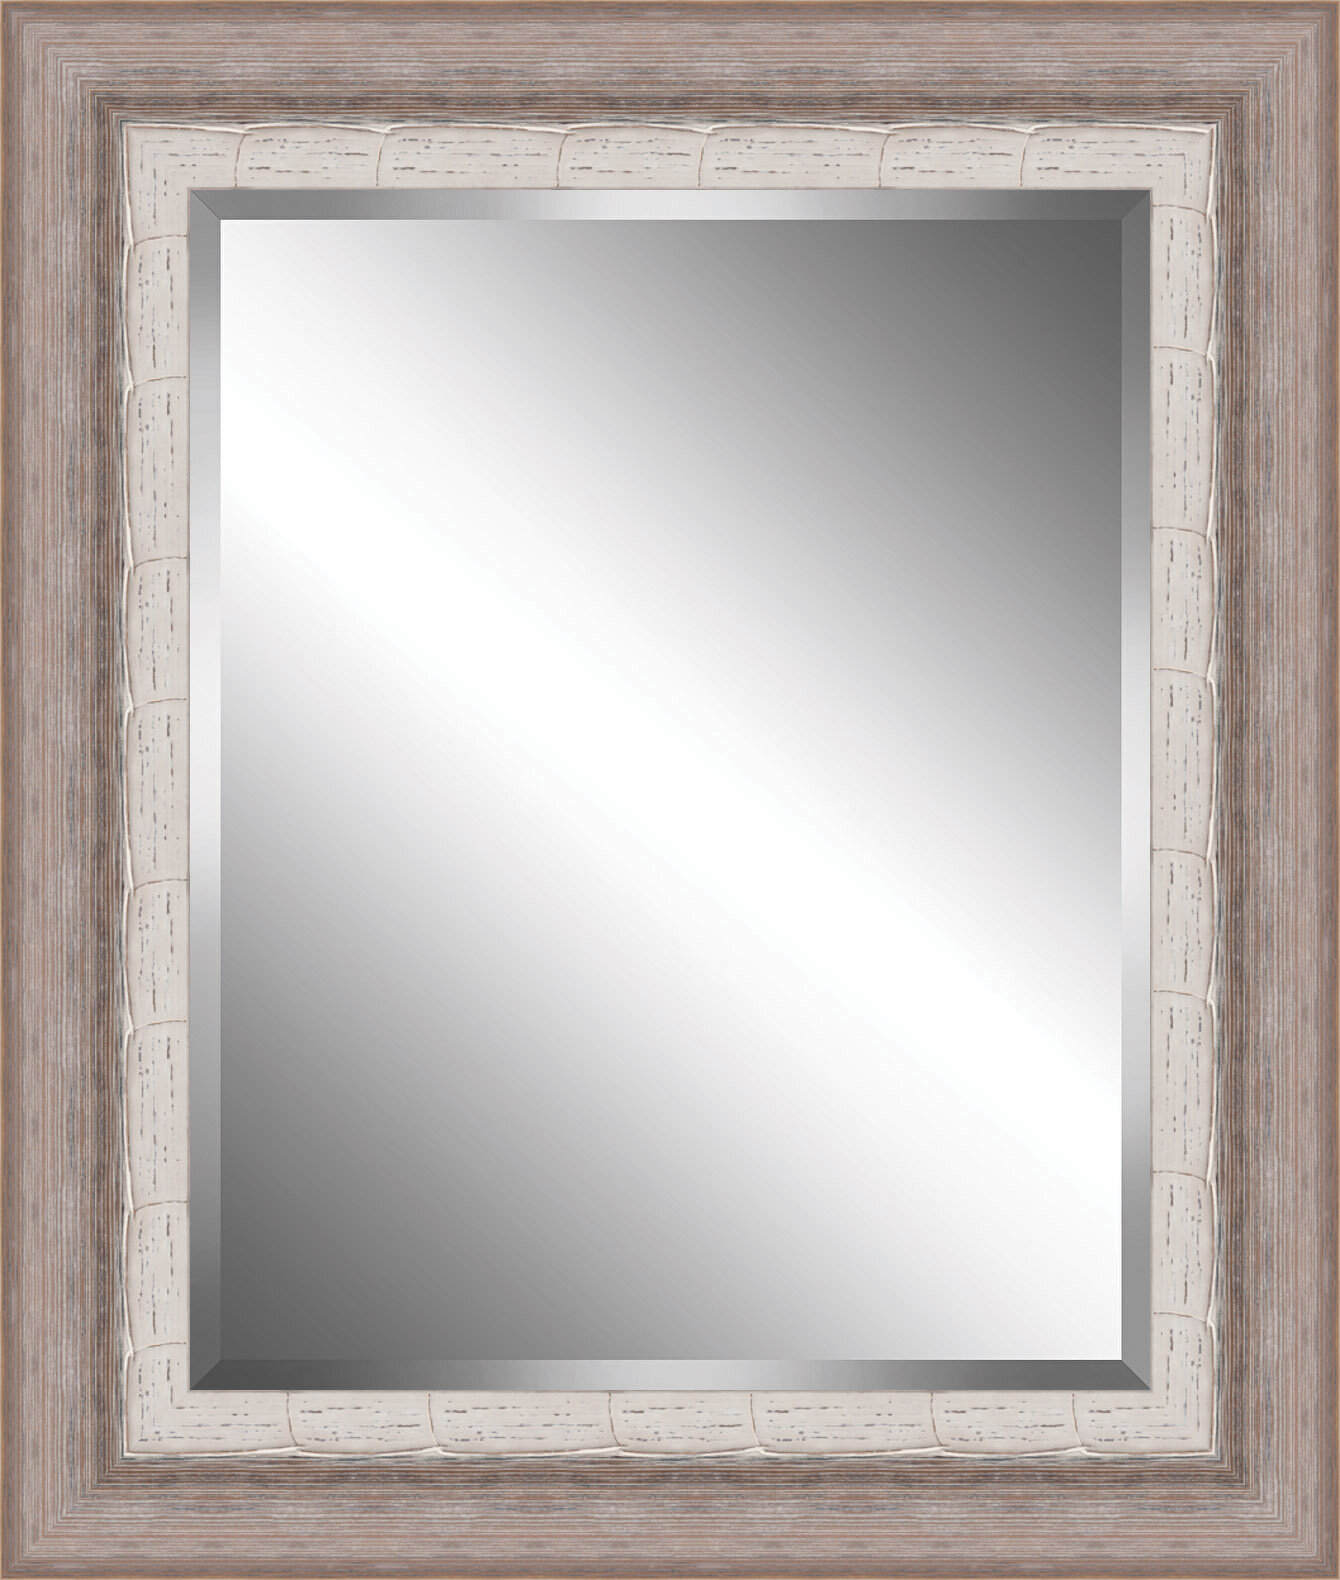 Ashton Wall Décor LLC Ribbed Wood Framed Beveled Plate Glass Mirror ...